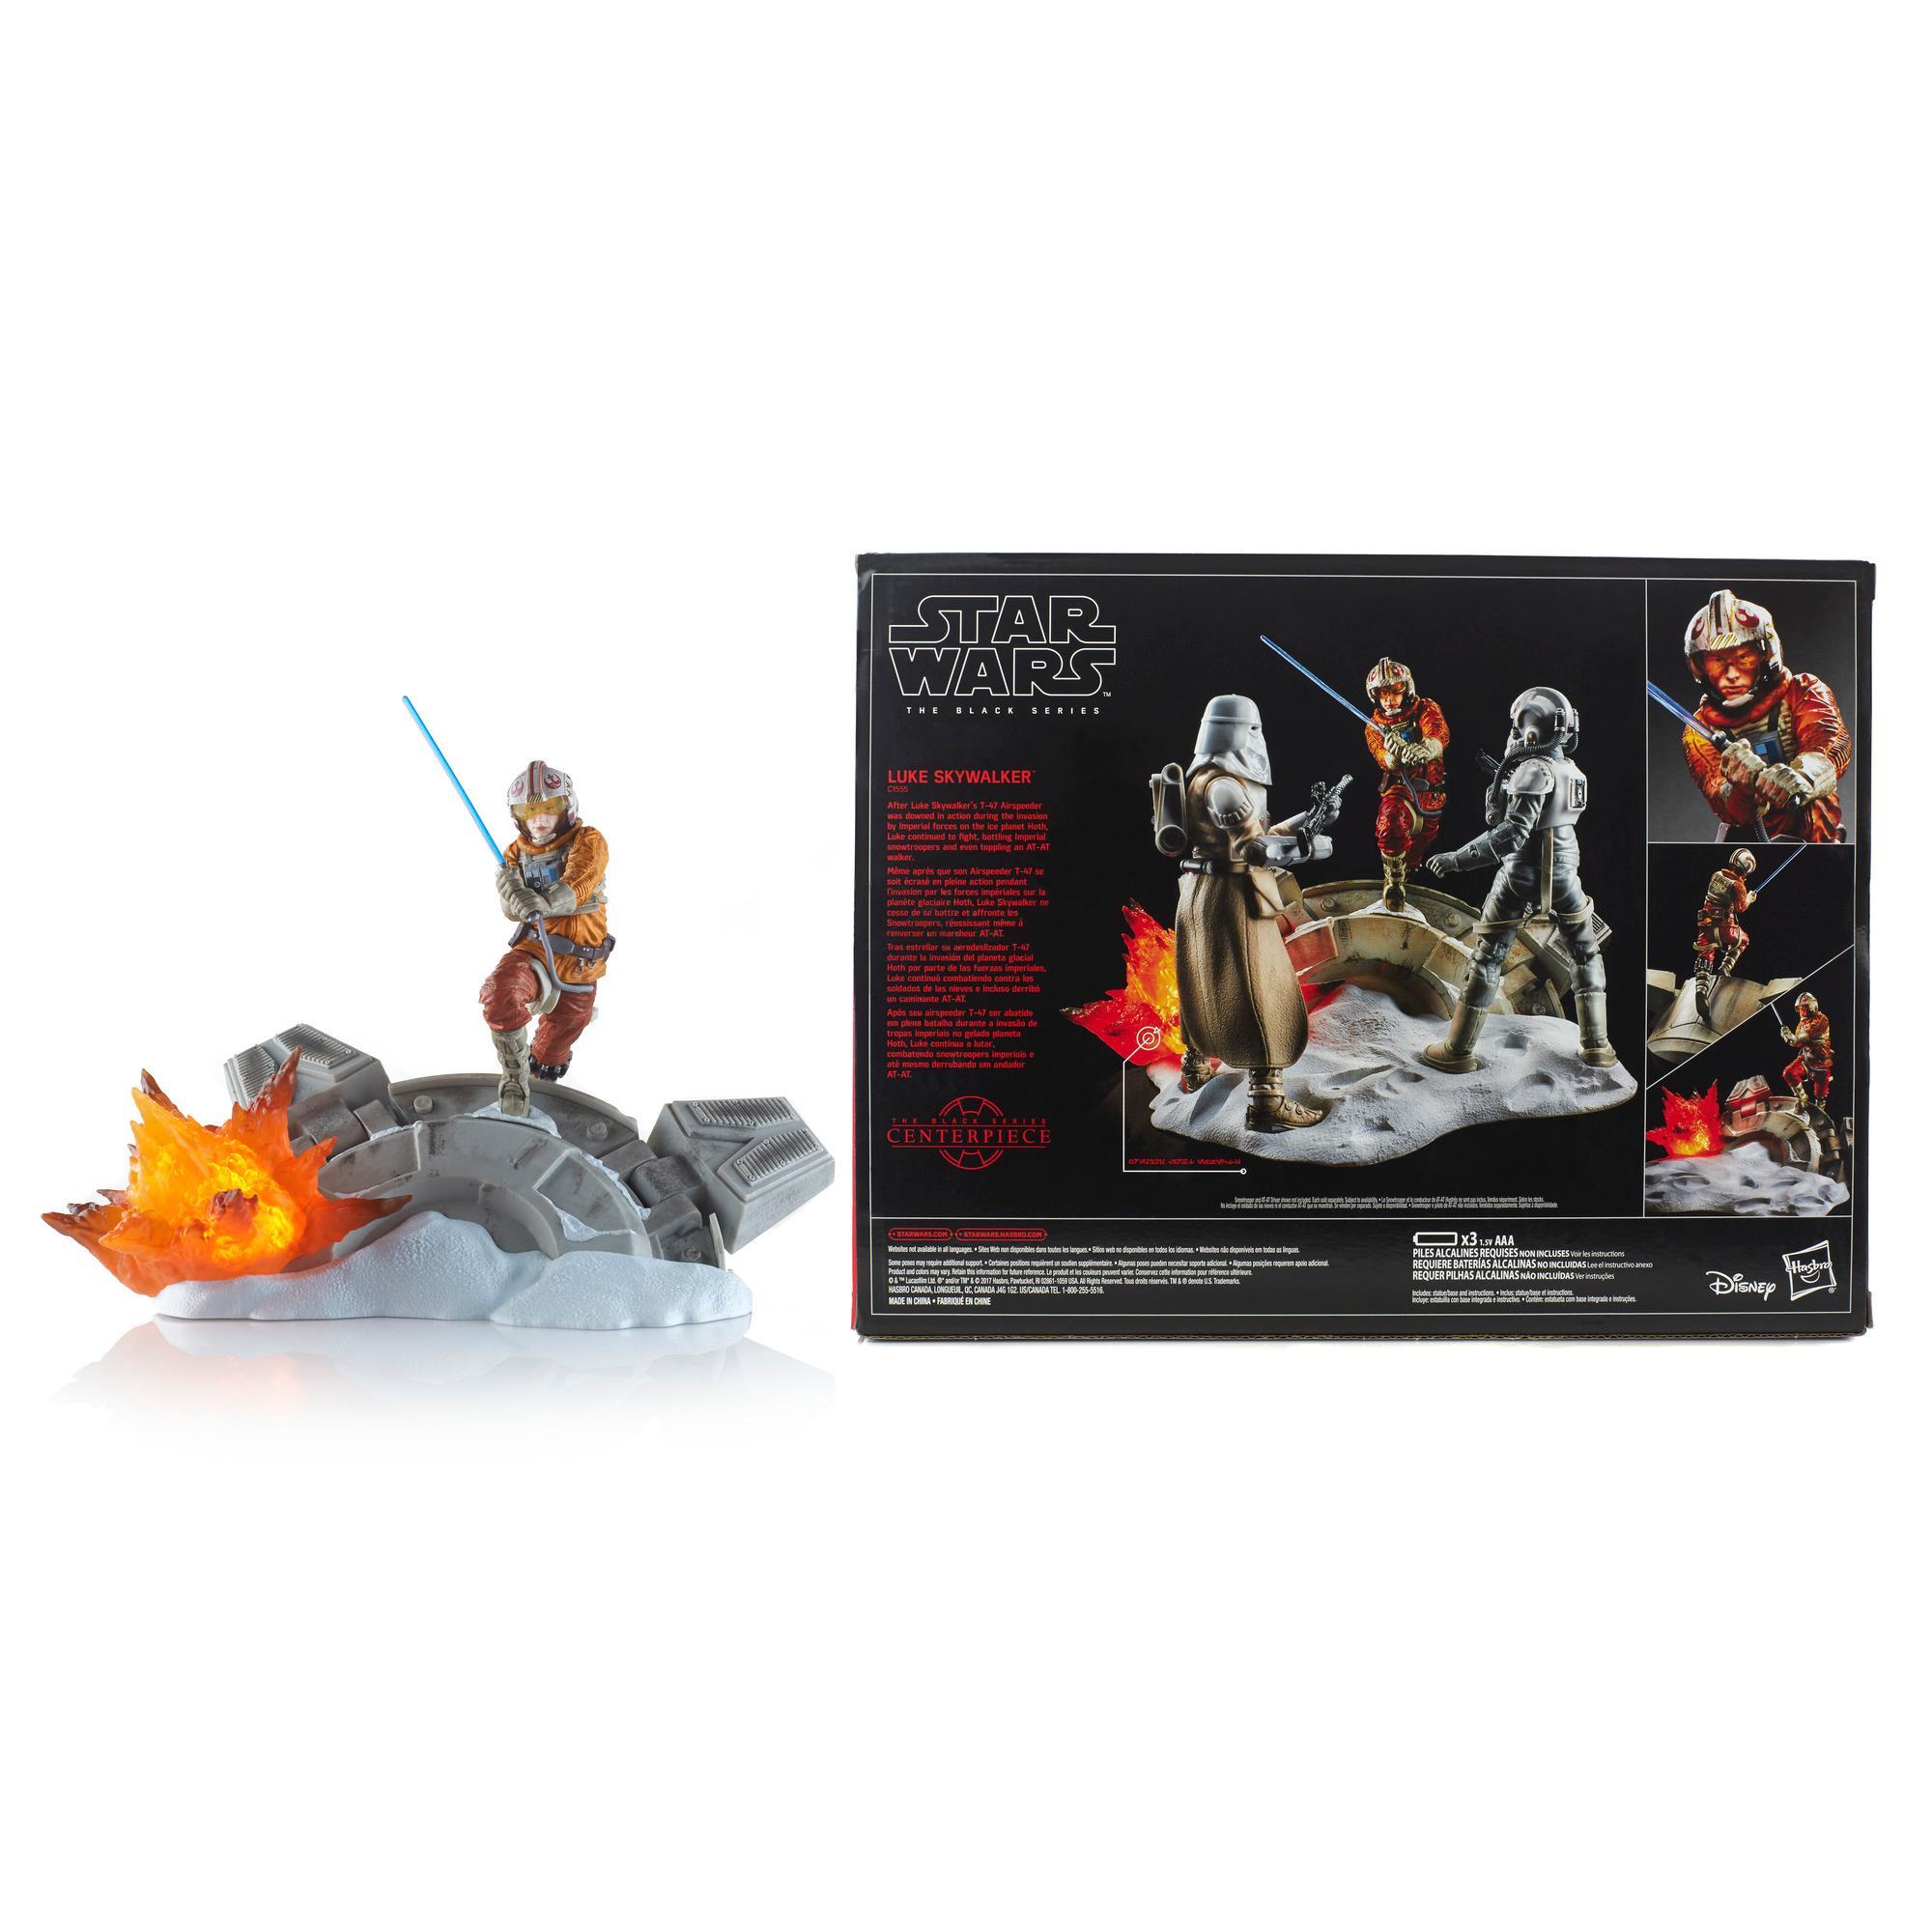 Star Wars The Black Series Centerpiece - Luke Skywalker